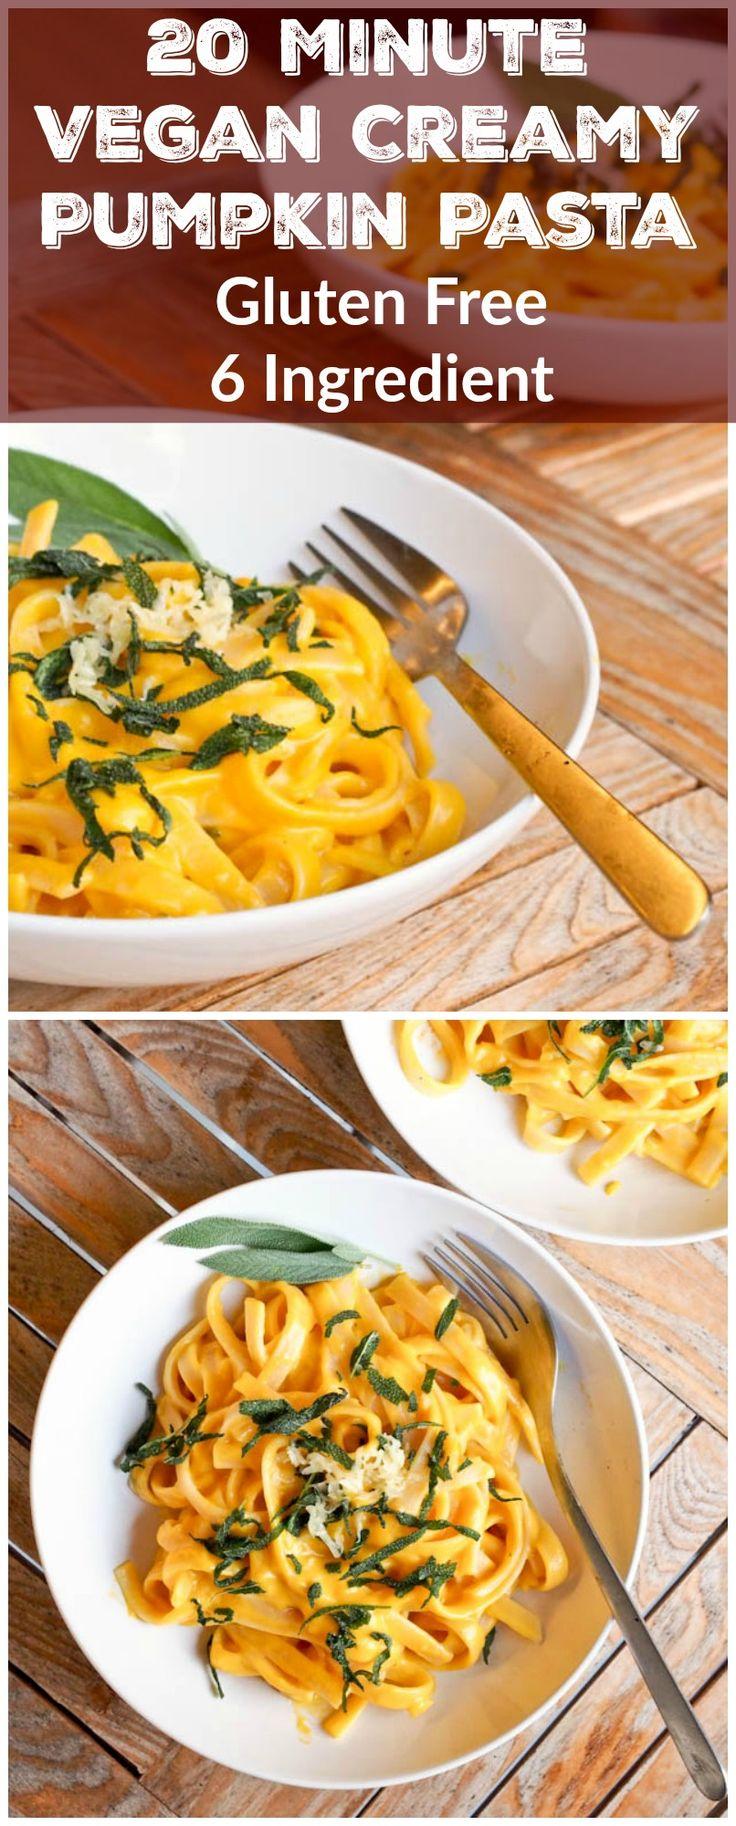 20 minute vegan creamy pumpkin pasta (GF)